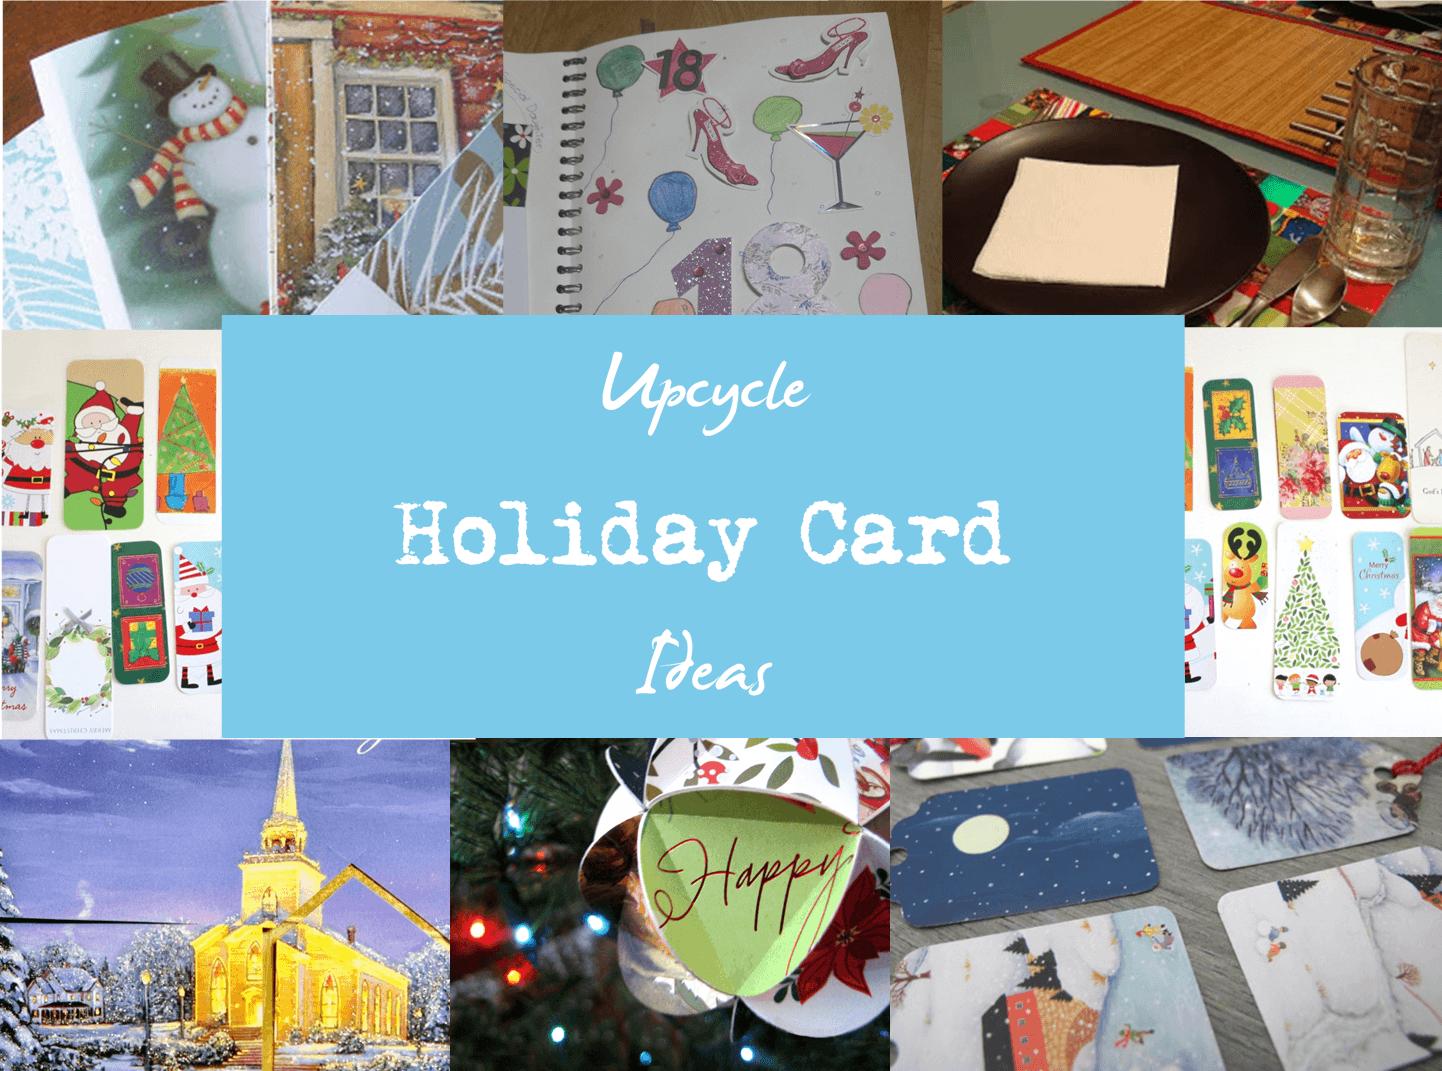 Upcycle Holiday Card Ideas - The Mummy Toolbox